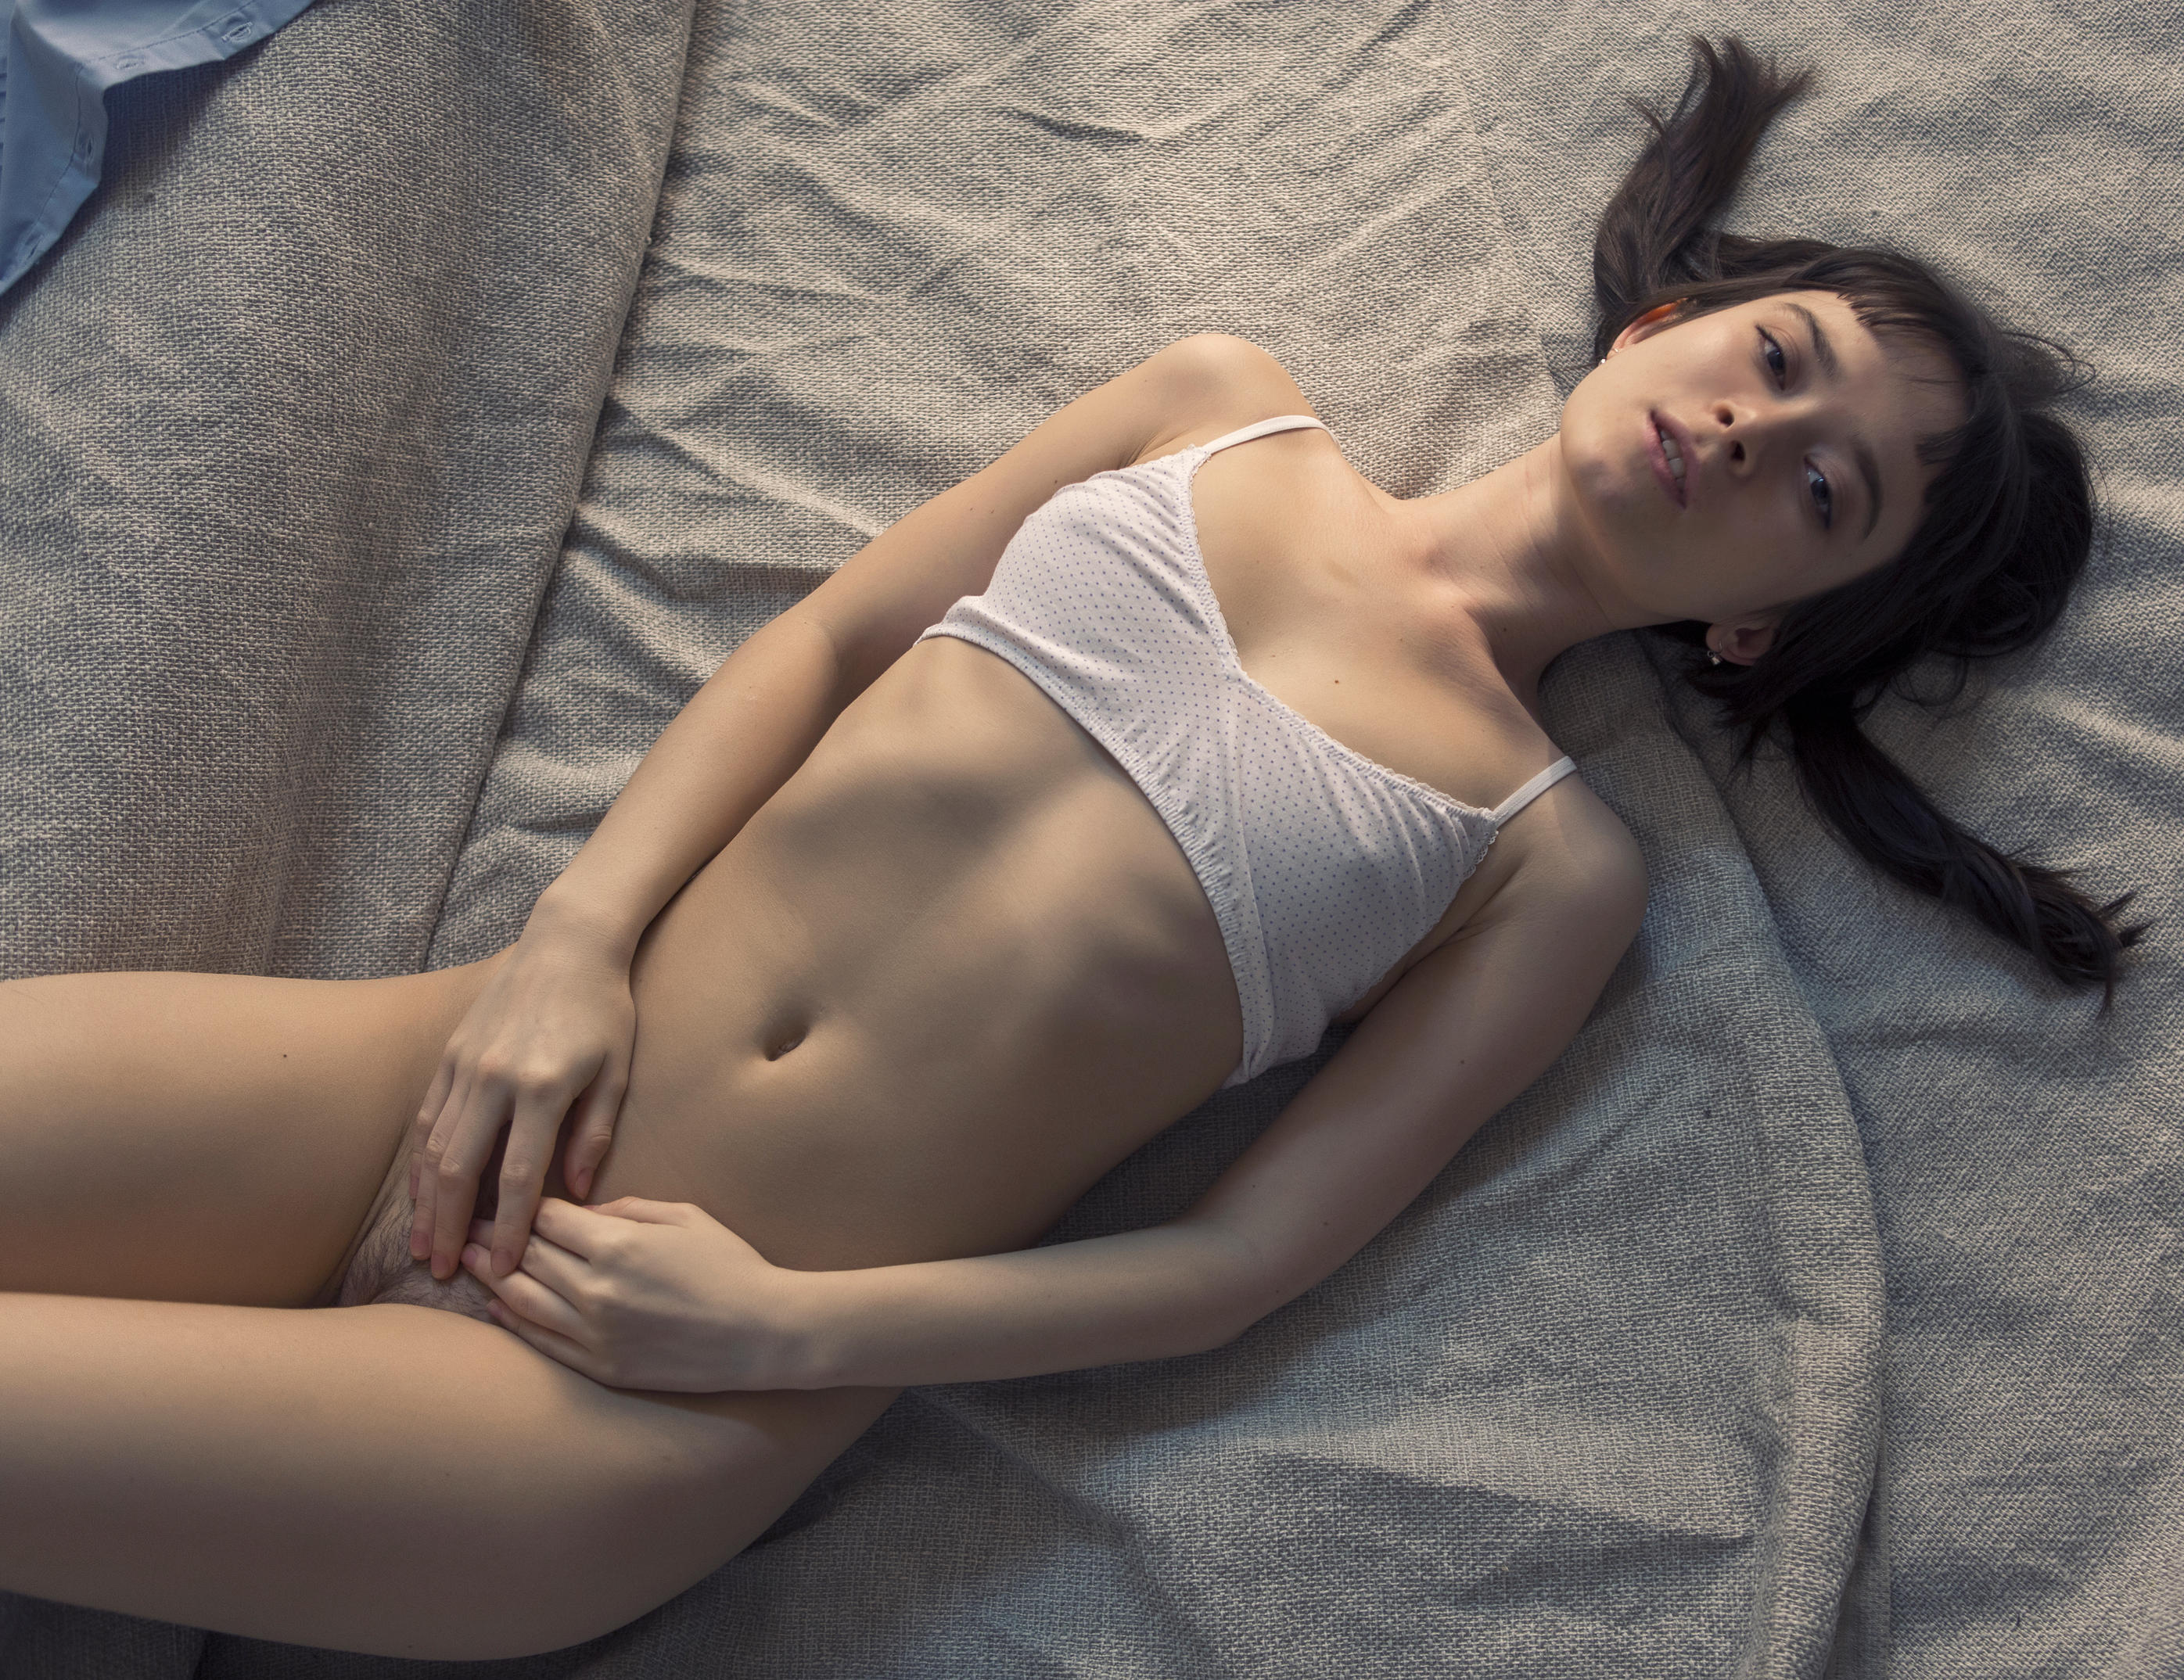 Polina Knyazeva By Pavel Kiselev